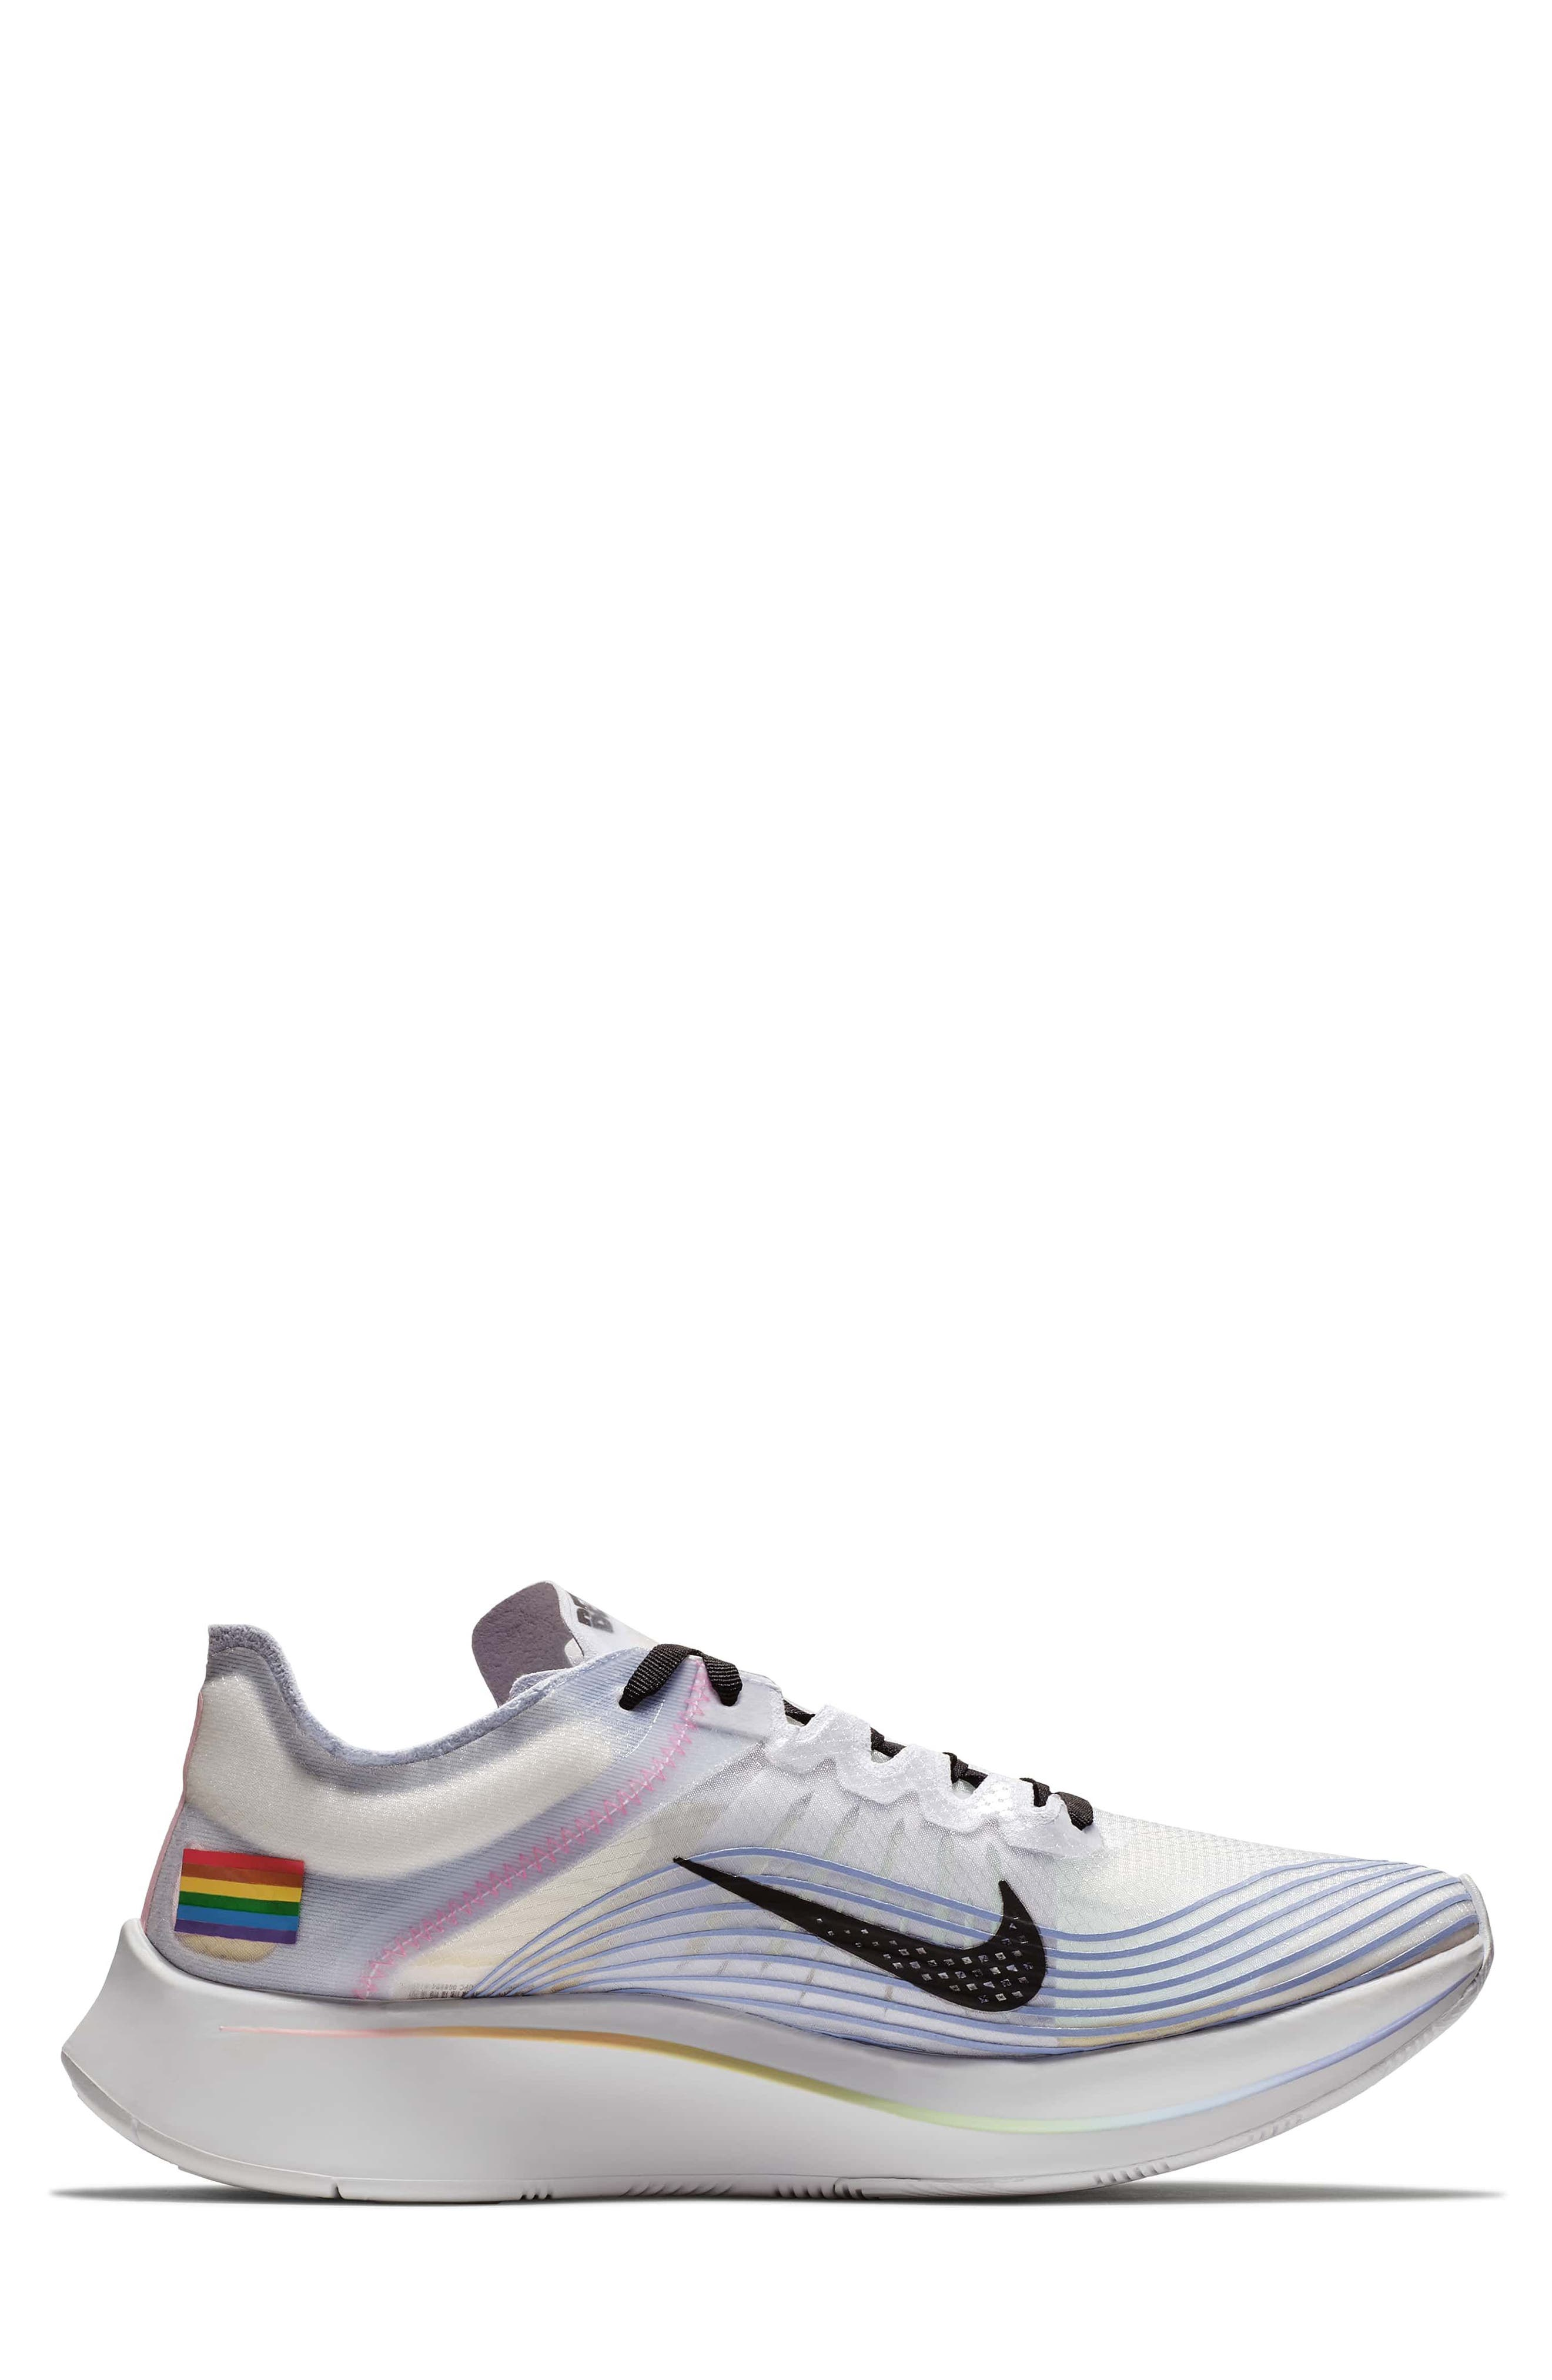 Nordstrom x Nike Zoom Fly BETRUE Running Shoe,                             Alternate thumbnail 4, color,                             White/ Black/ Palest Purple